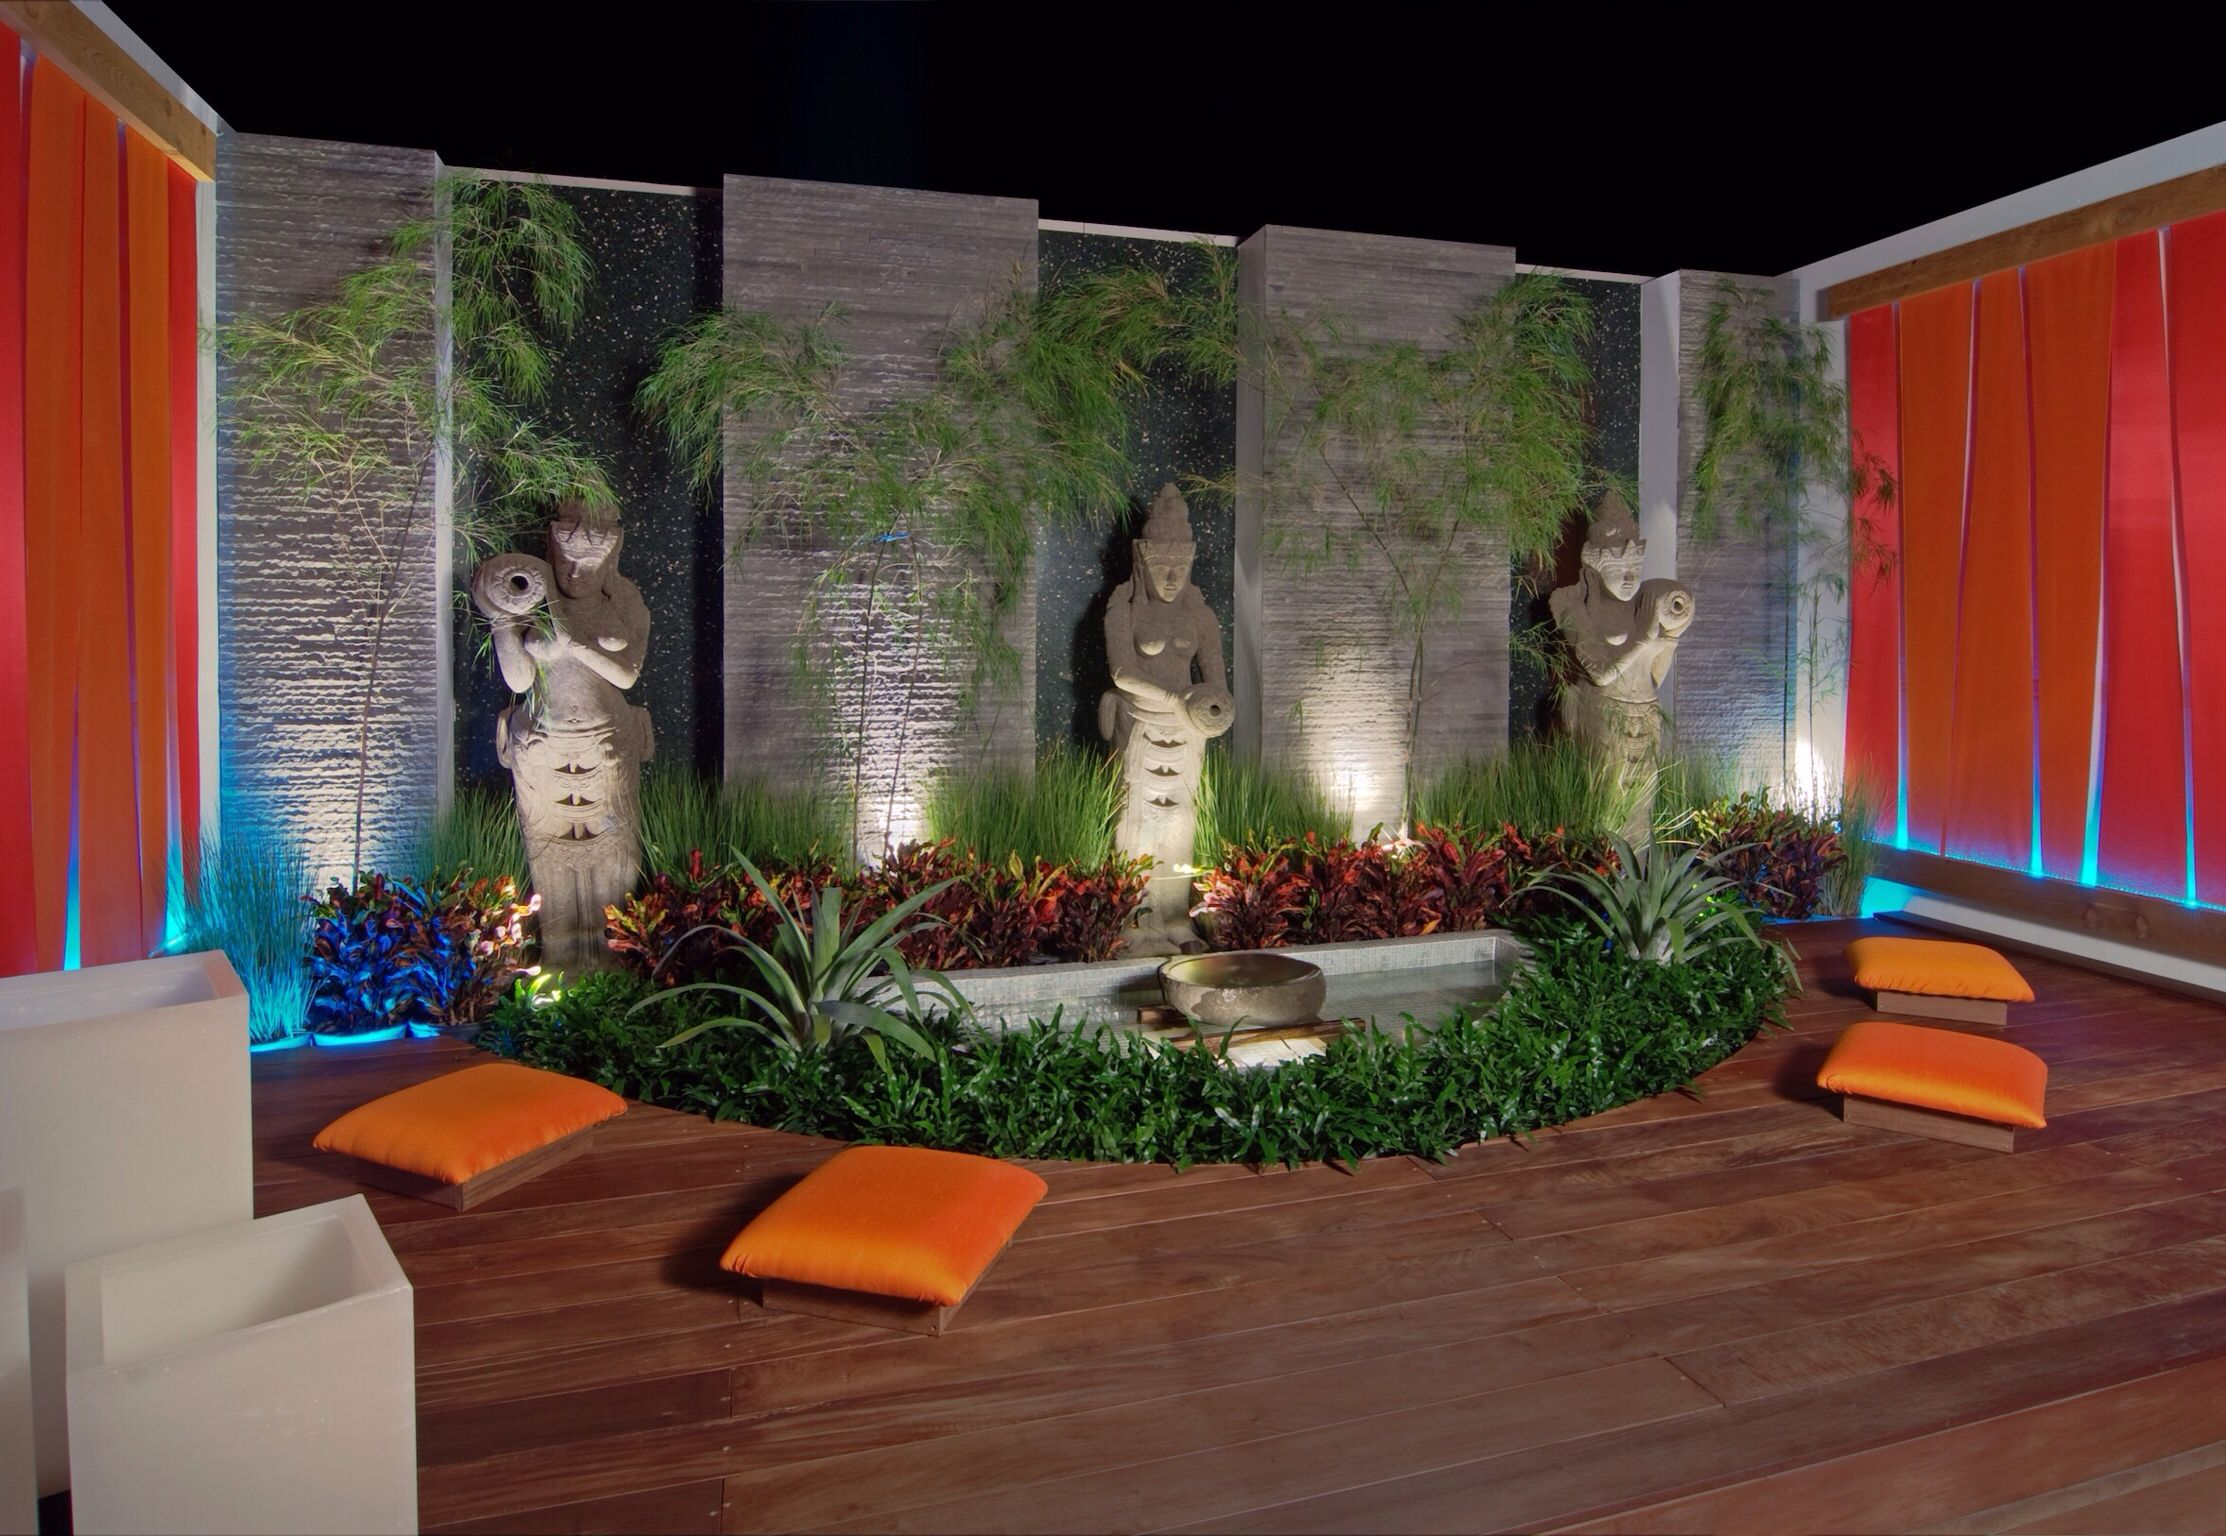 Bali style courtyard